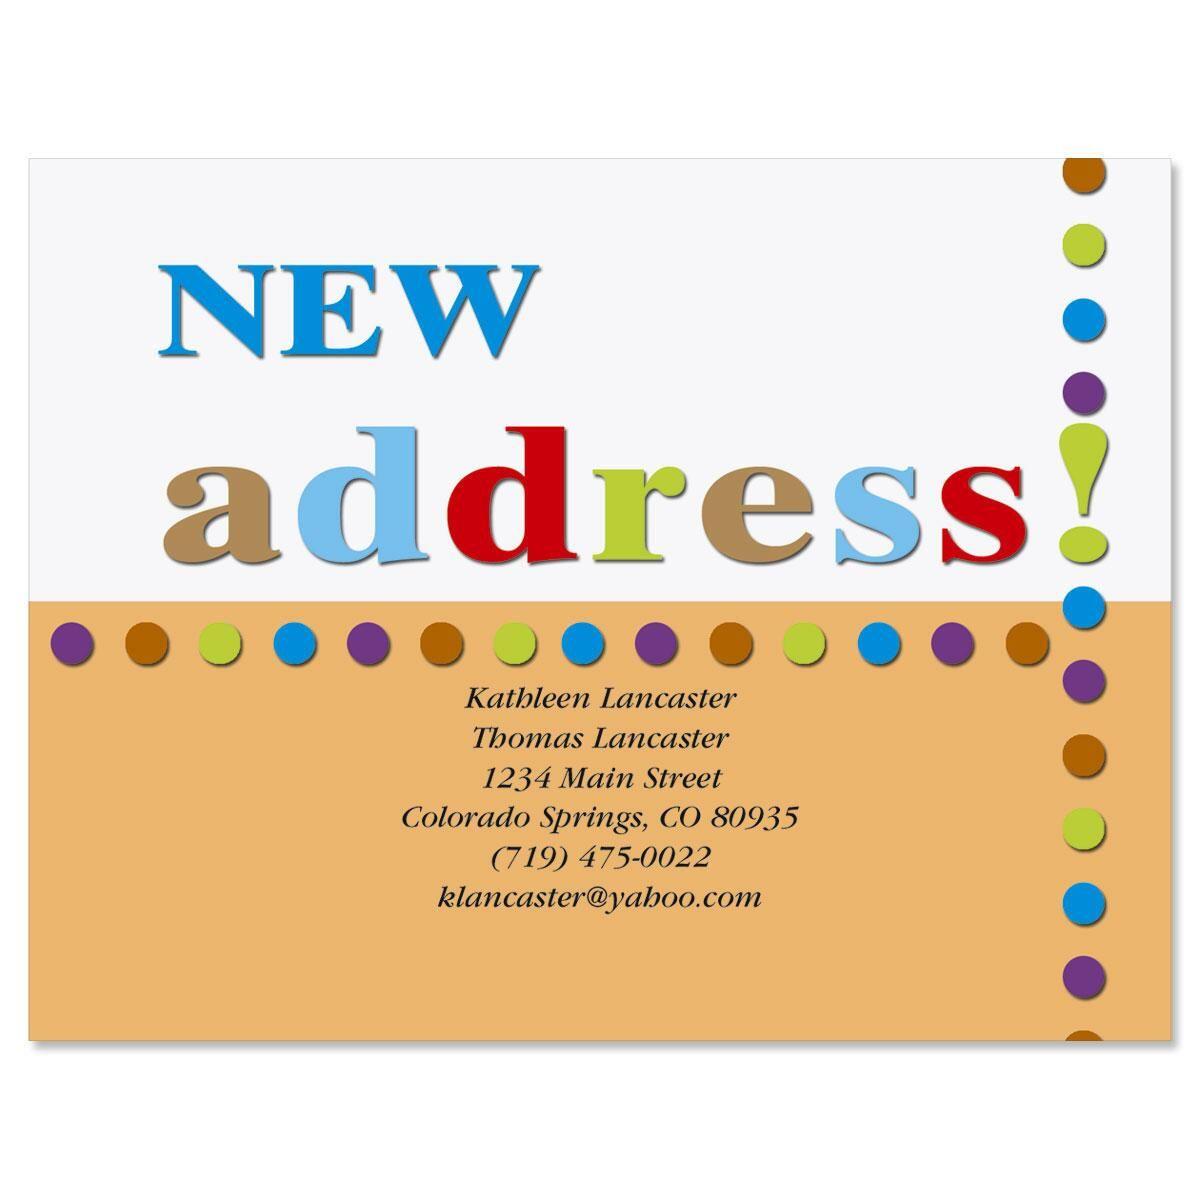 New Address Postcards